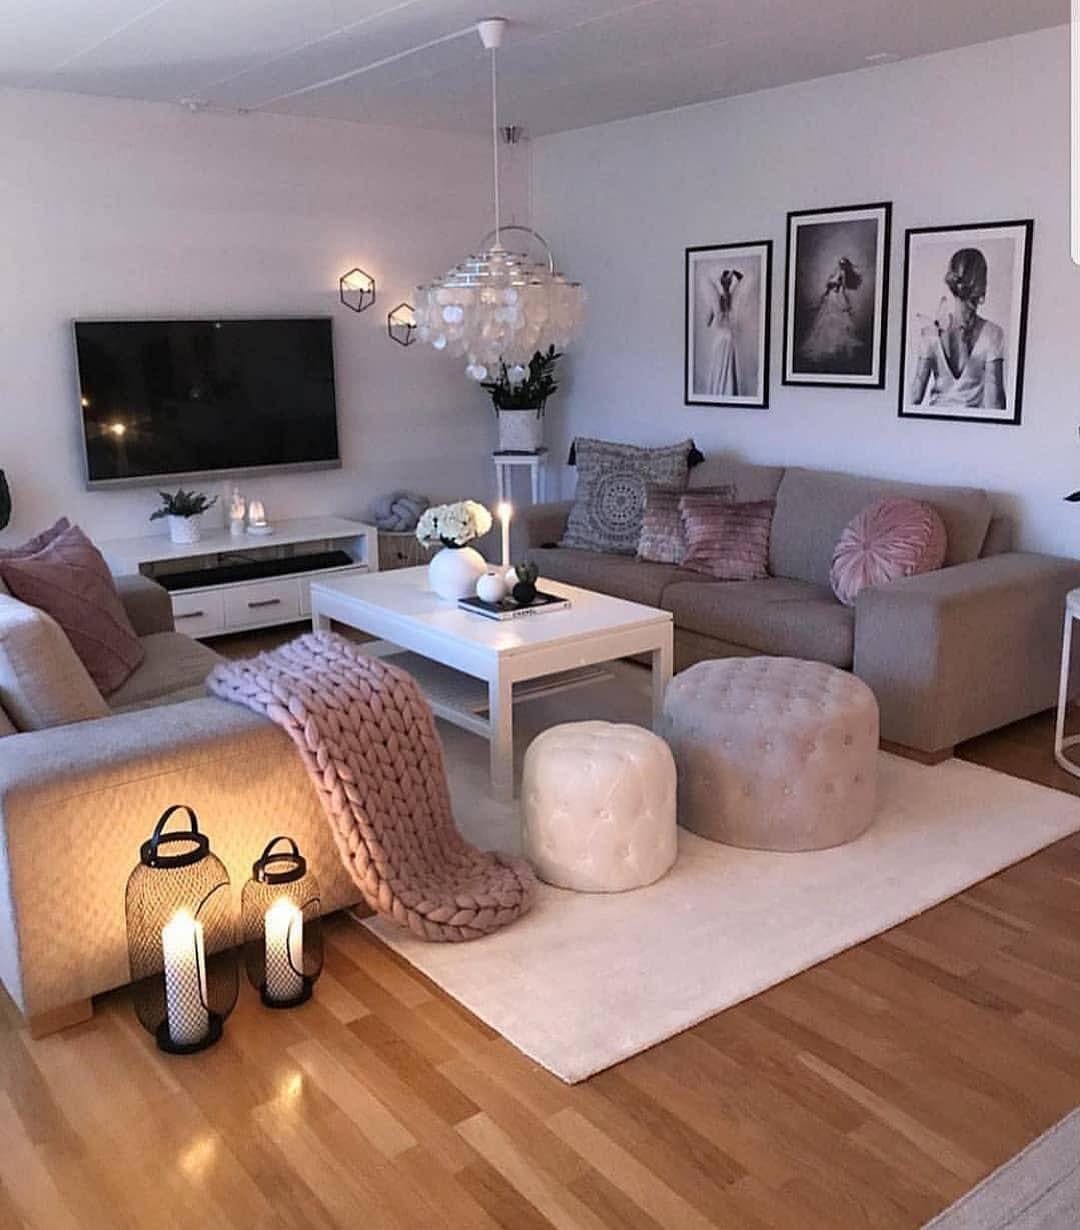 50 Brilliant Living Room Decor Ideas In 2019: 40+ Most Beautiful Living Room Ideas 2019